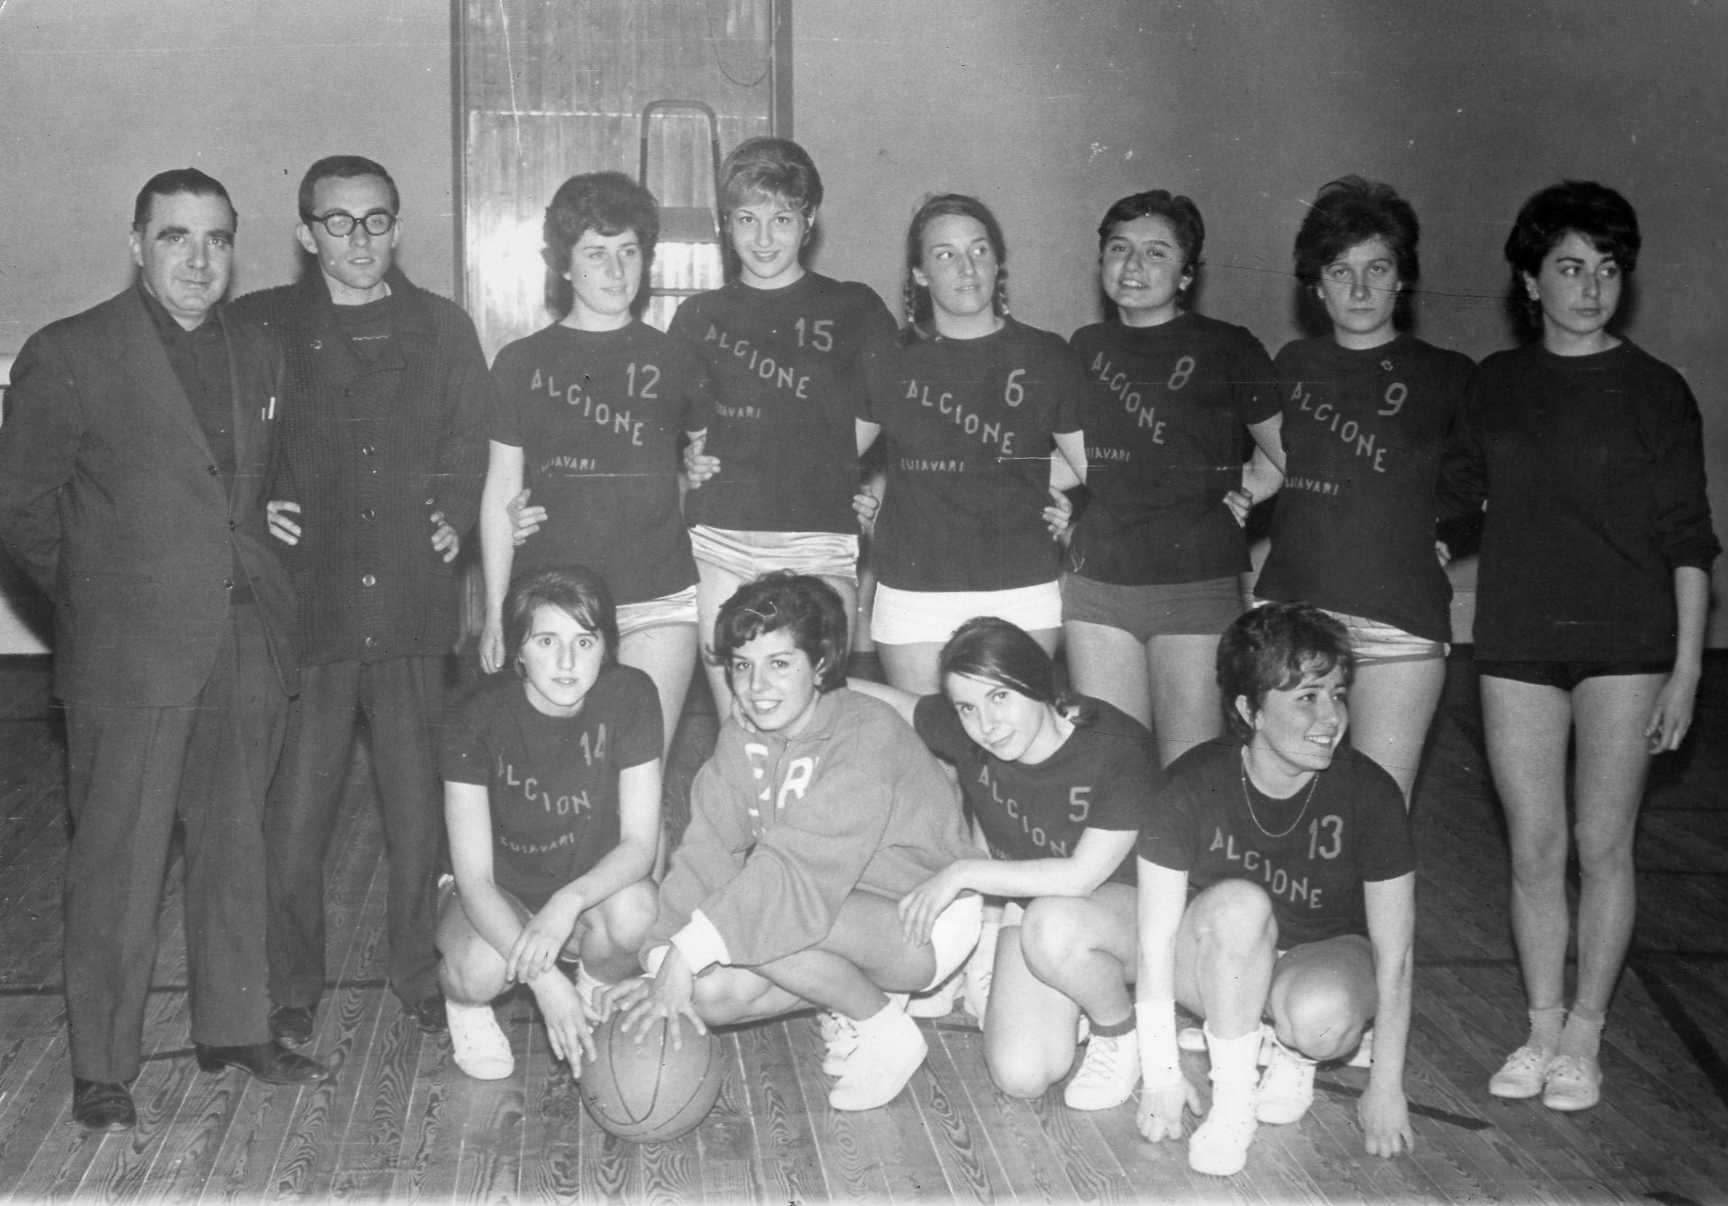 camp-to-serie-b-femm-le-1964-1965